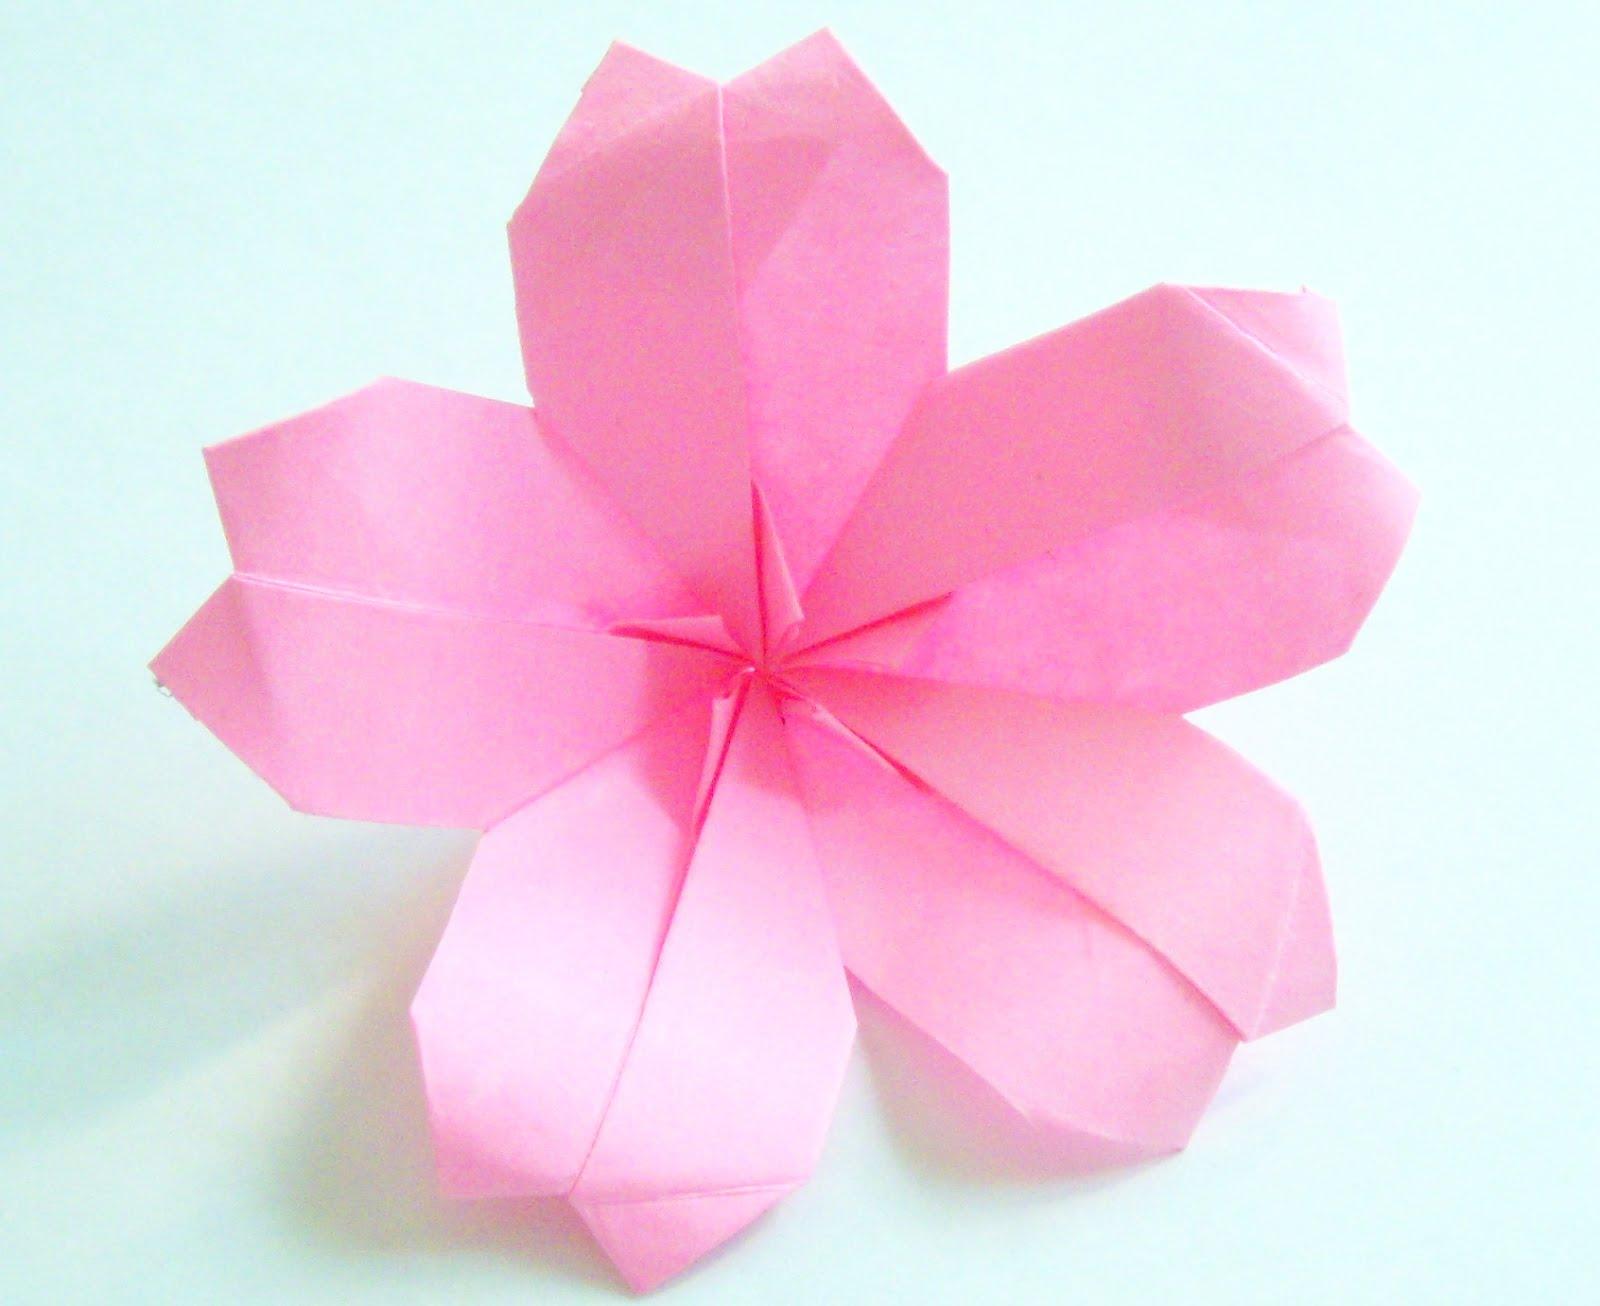 Origami origami cherry blossom - Origami origami origami ...